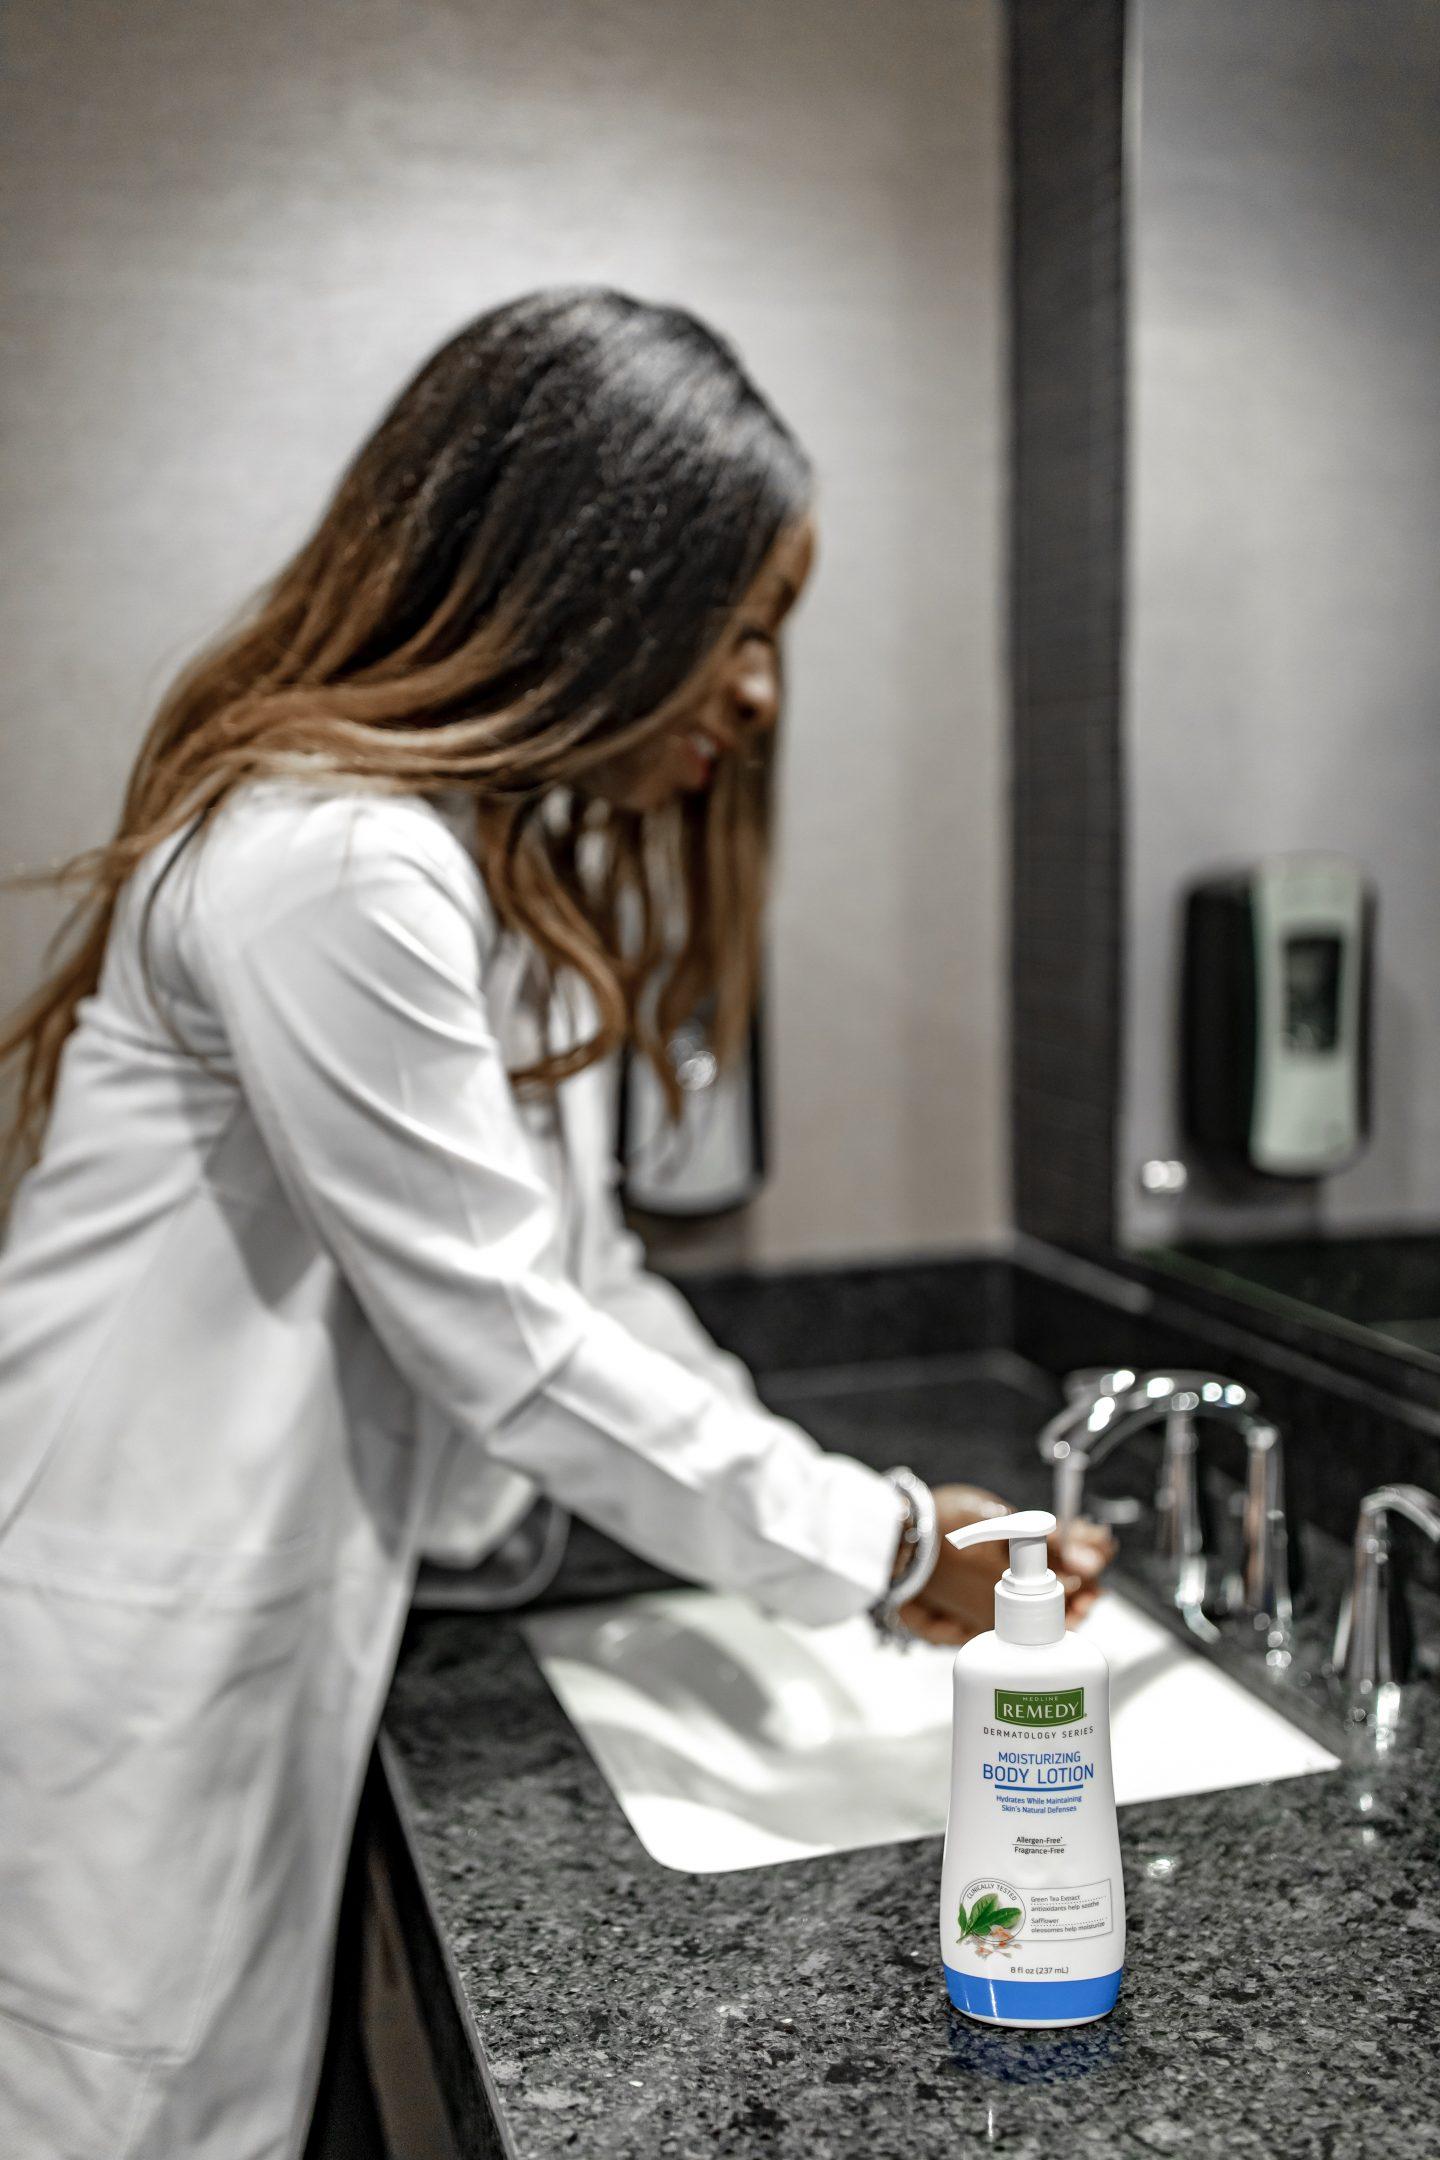 Hand Washing During Flu Season: Stay Prepared